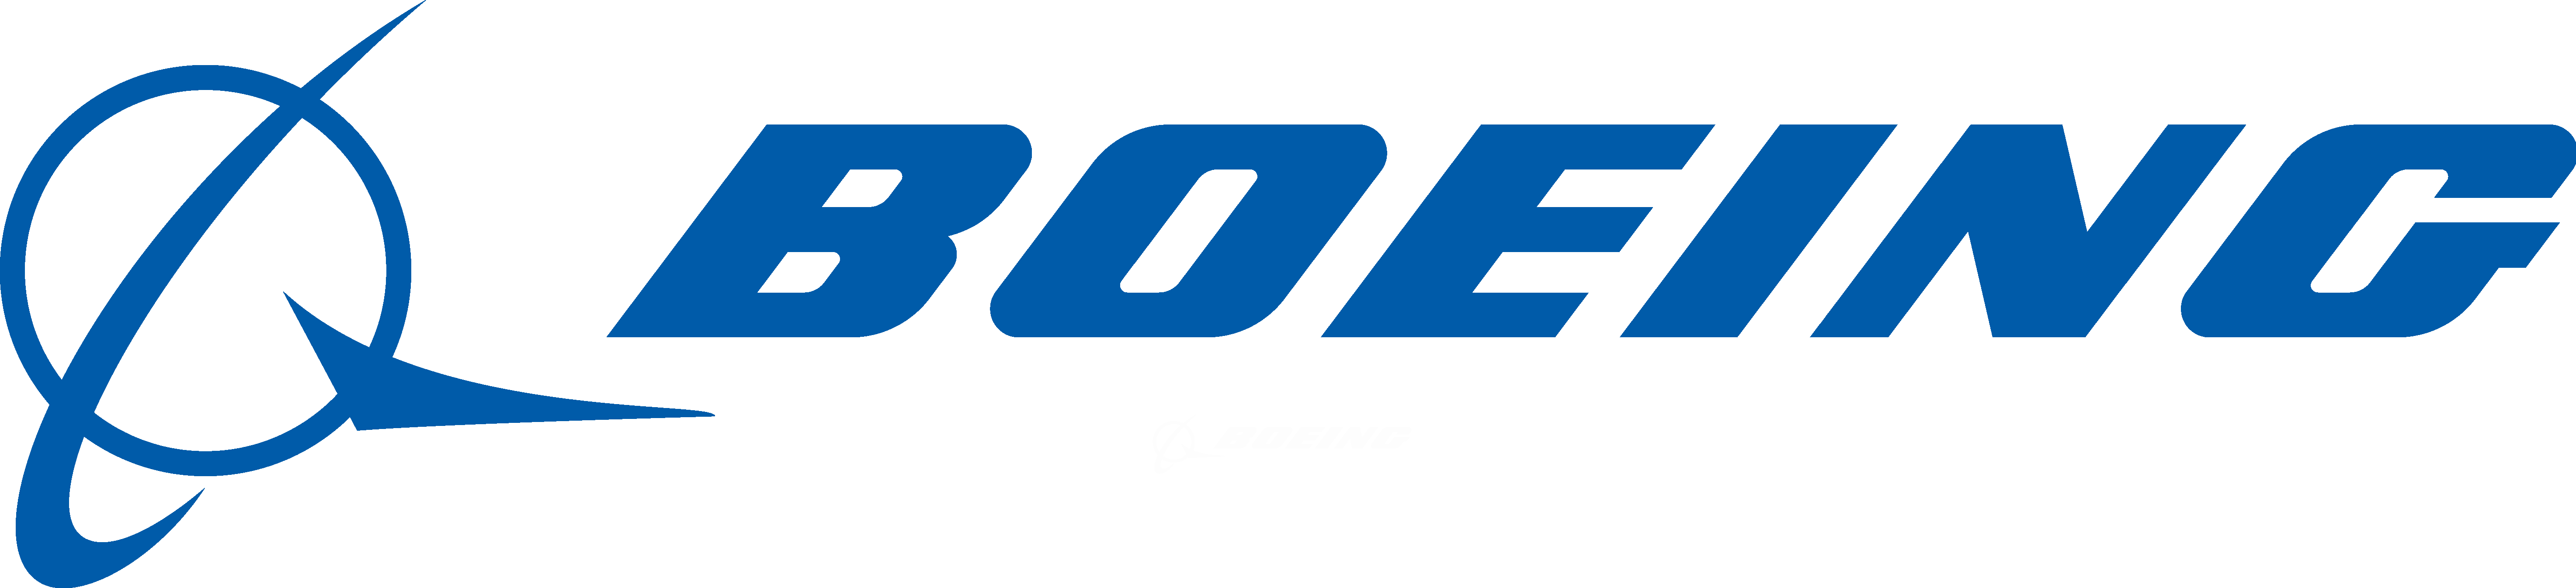 Boeing_logo_blue